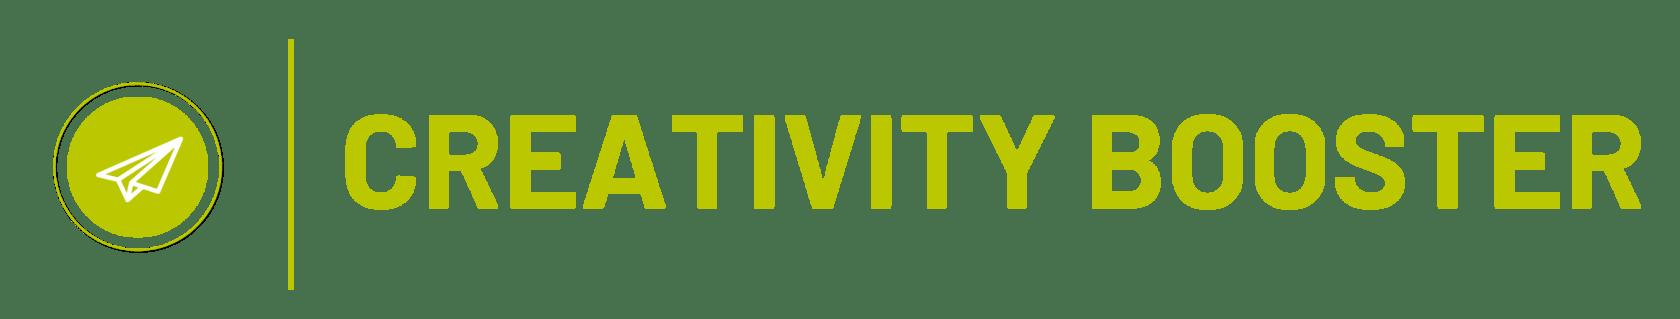 Header CREATIVITYBOOSTERcerchio-01